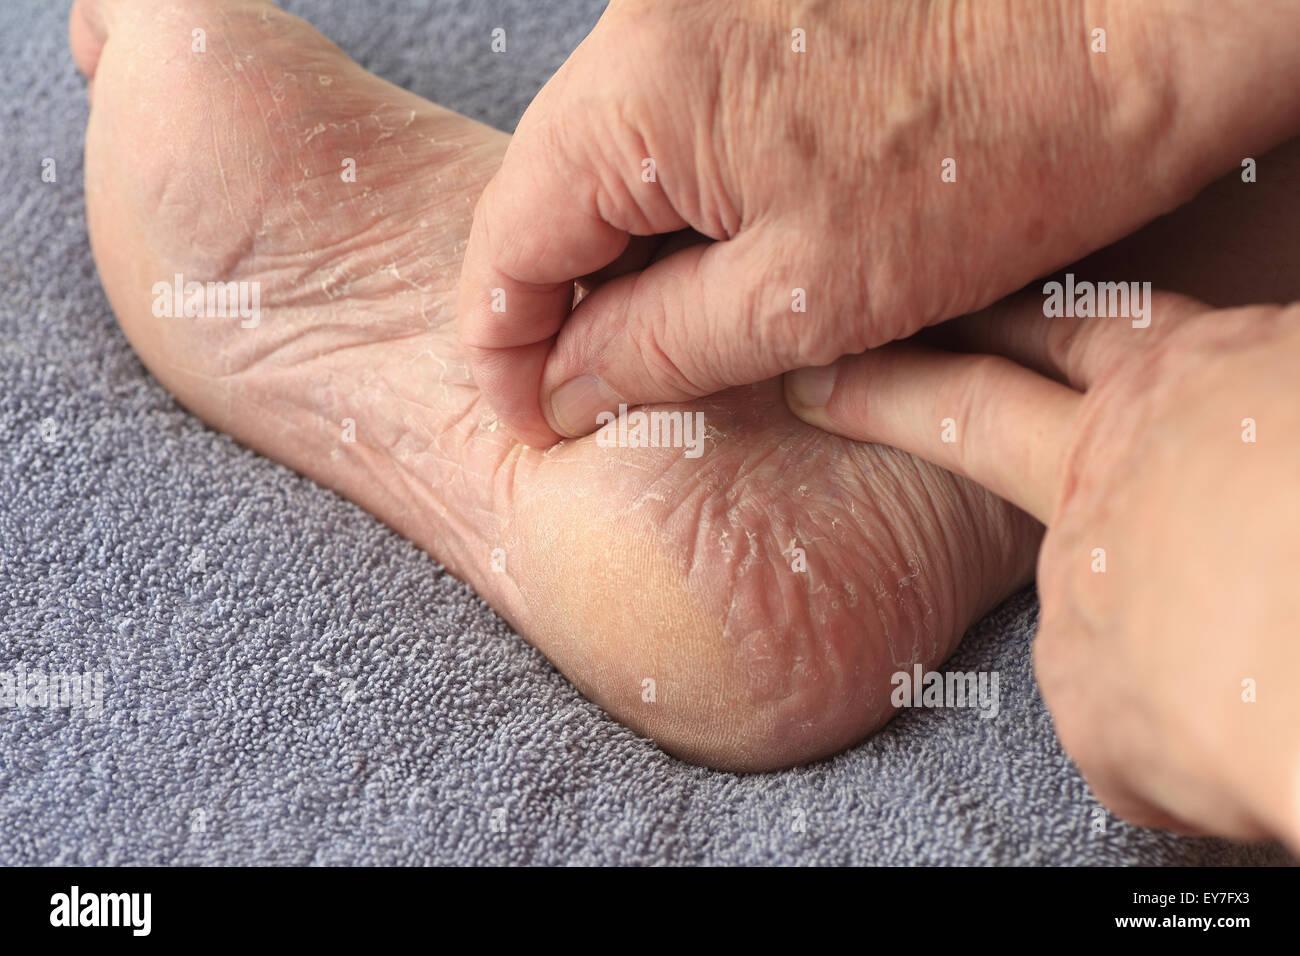 A man peeling his athletes foot dry skin Stock Photo